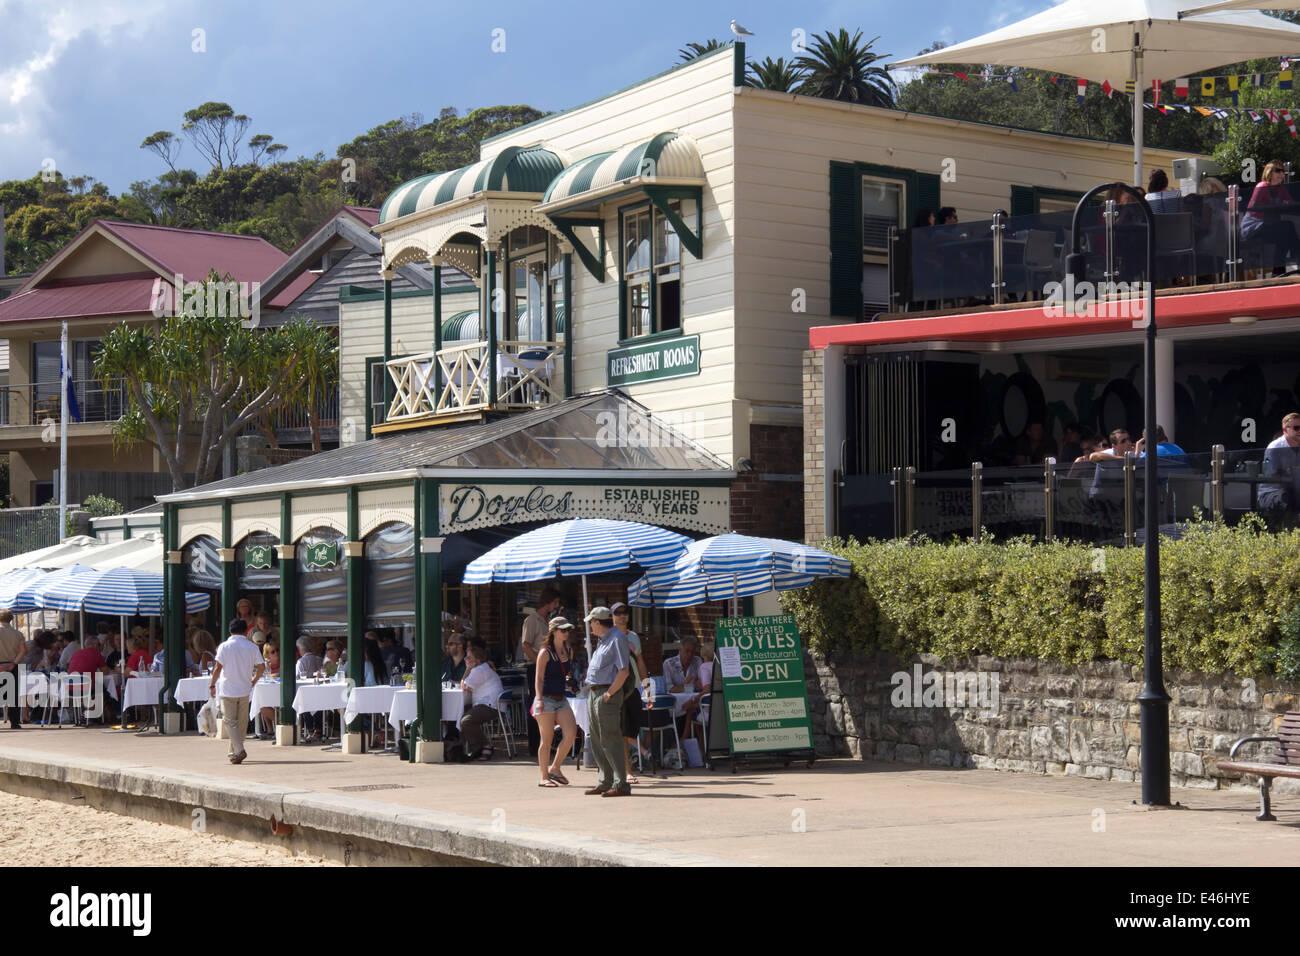 Doyle's restaurant in Watson's Bay, Sydney, New South Wales, NSW, Australia - Stock Image